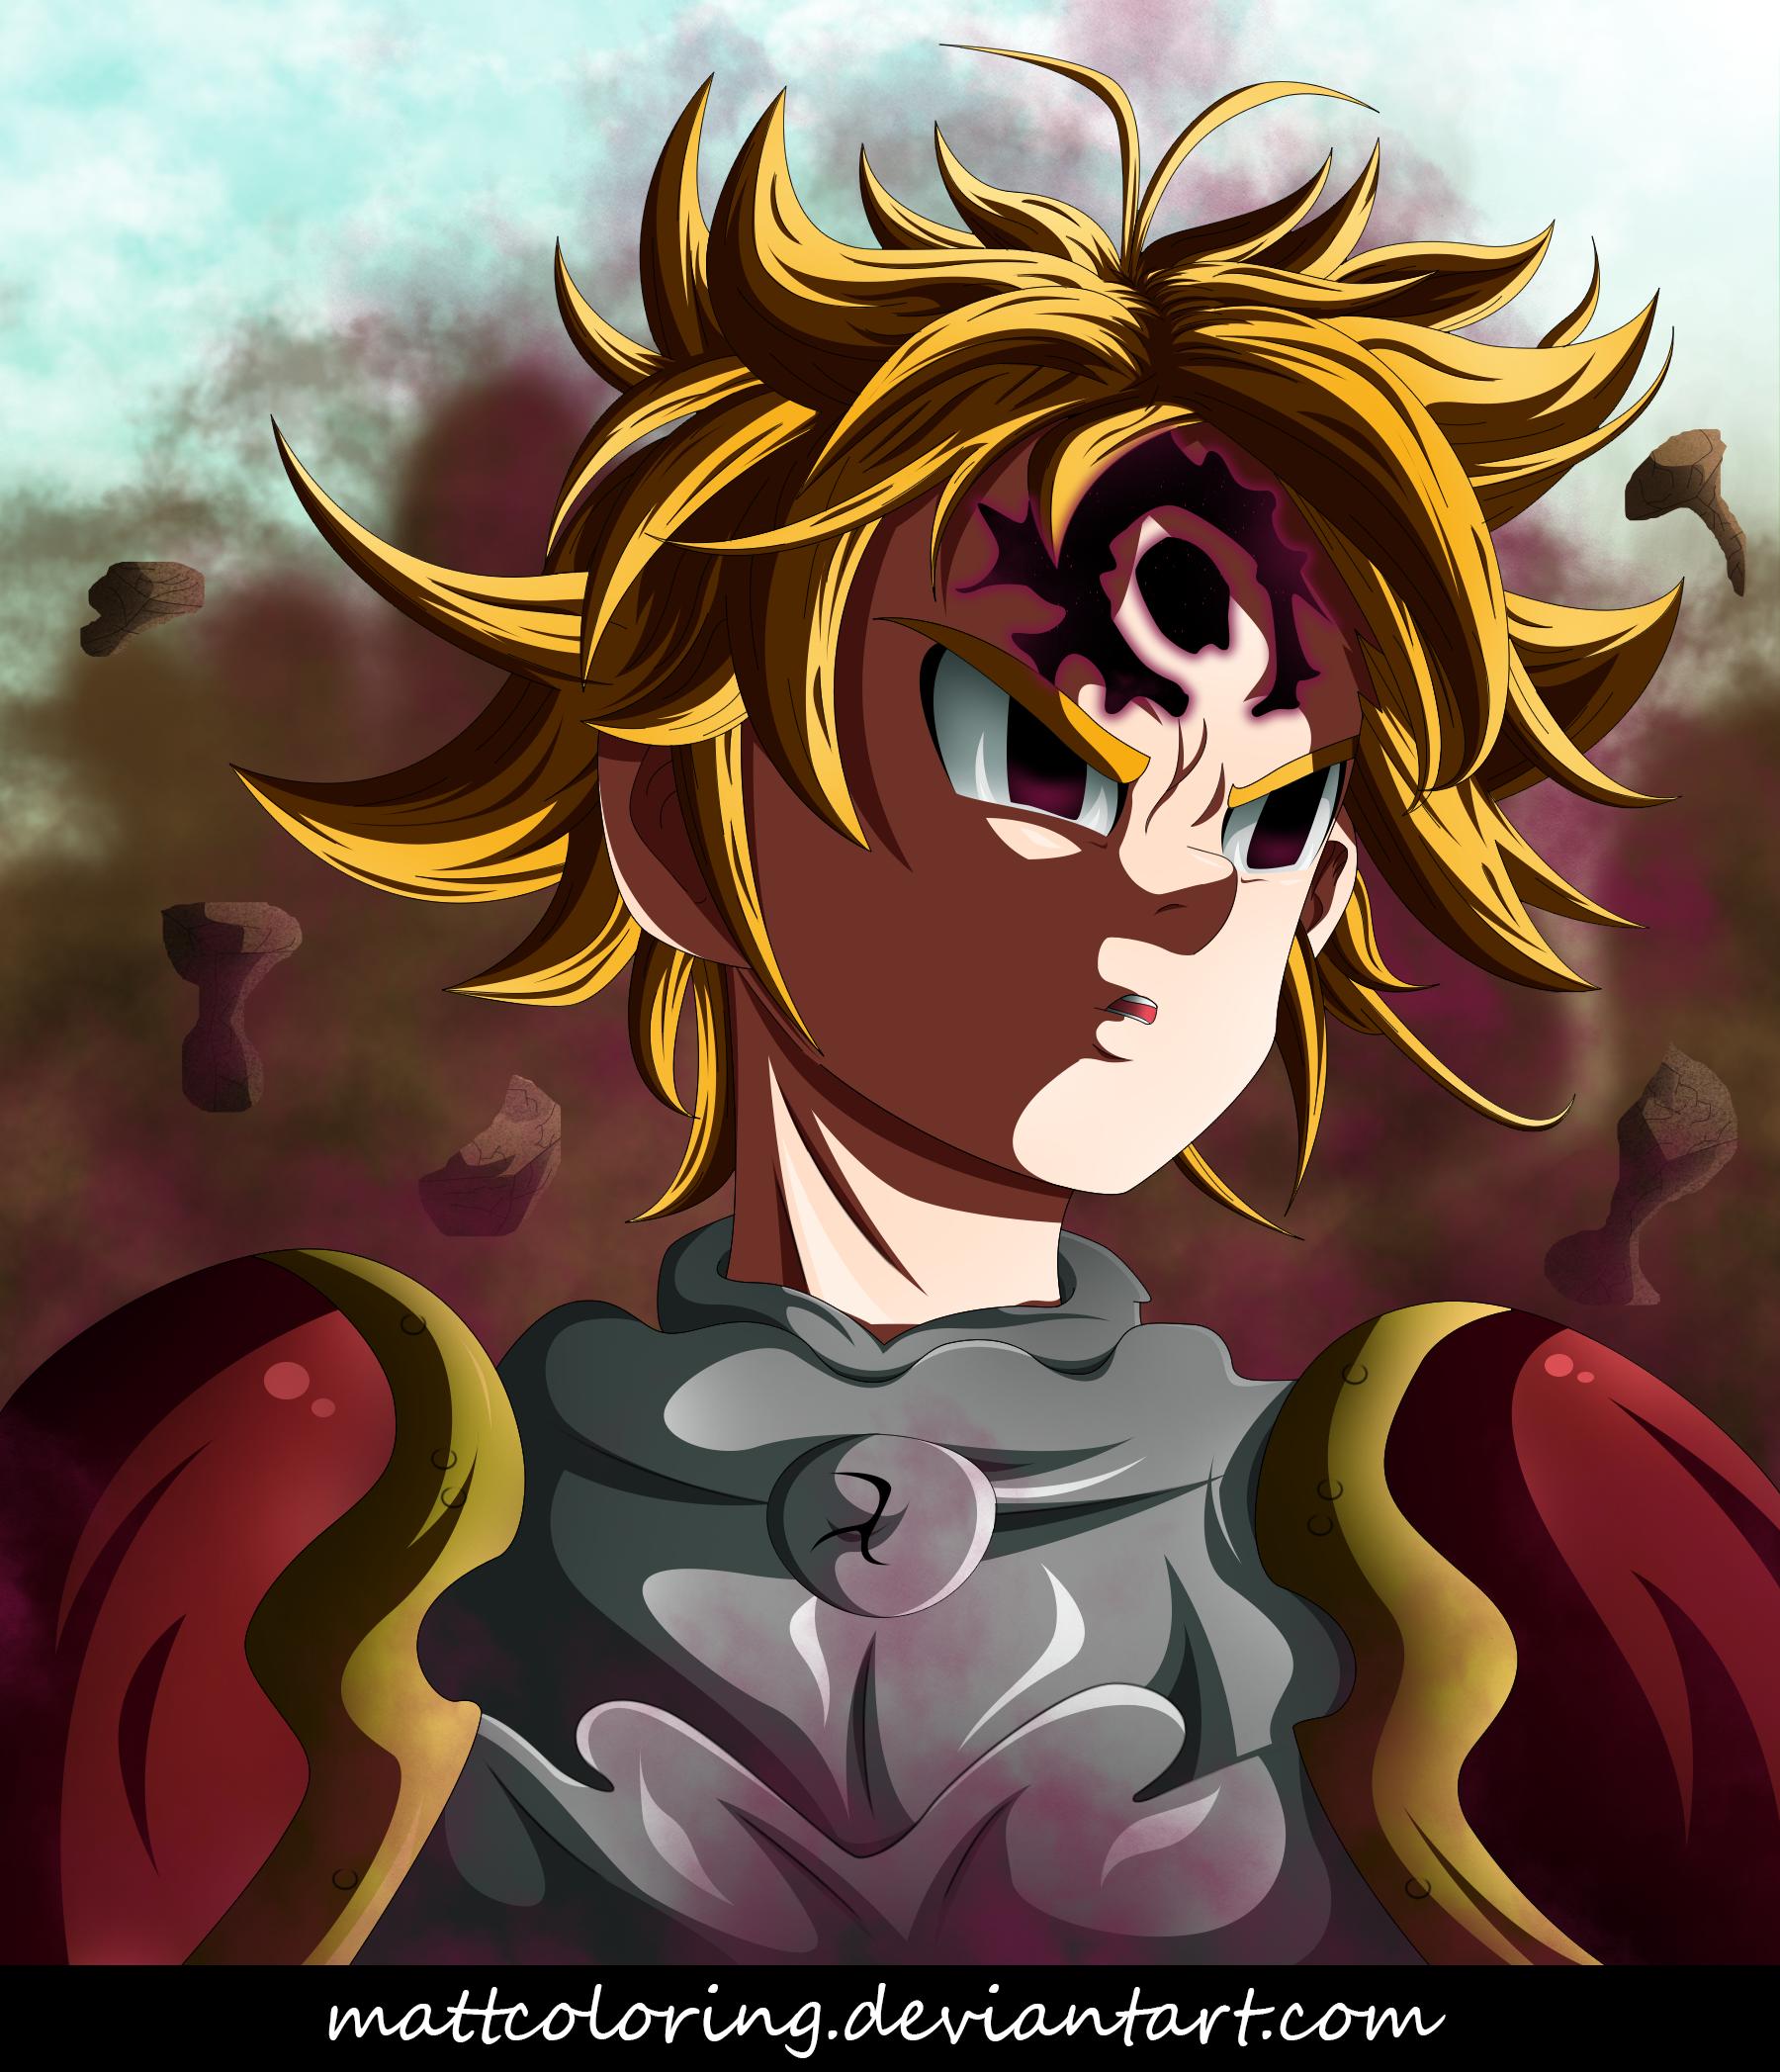 nanatsu no taizai meliodas demon vs merascylla by mattcoloring on